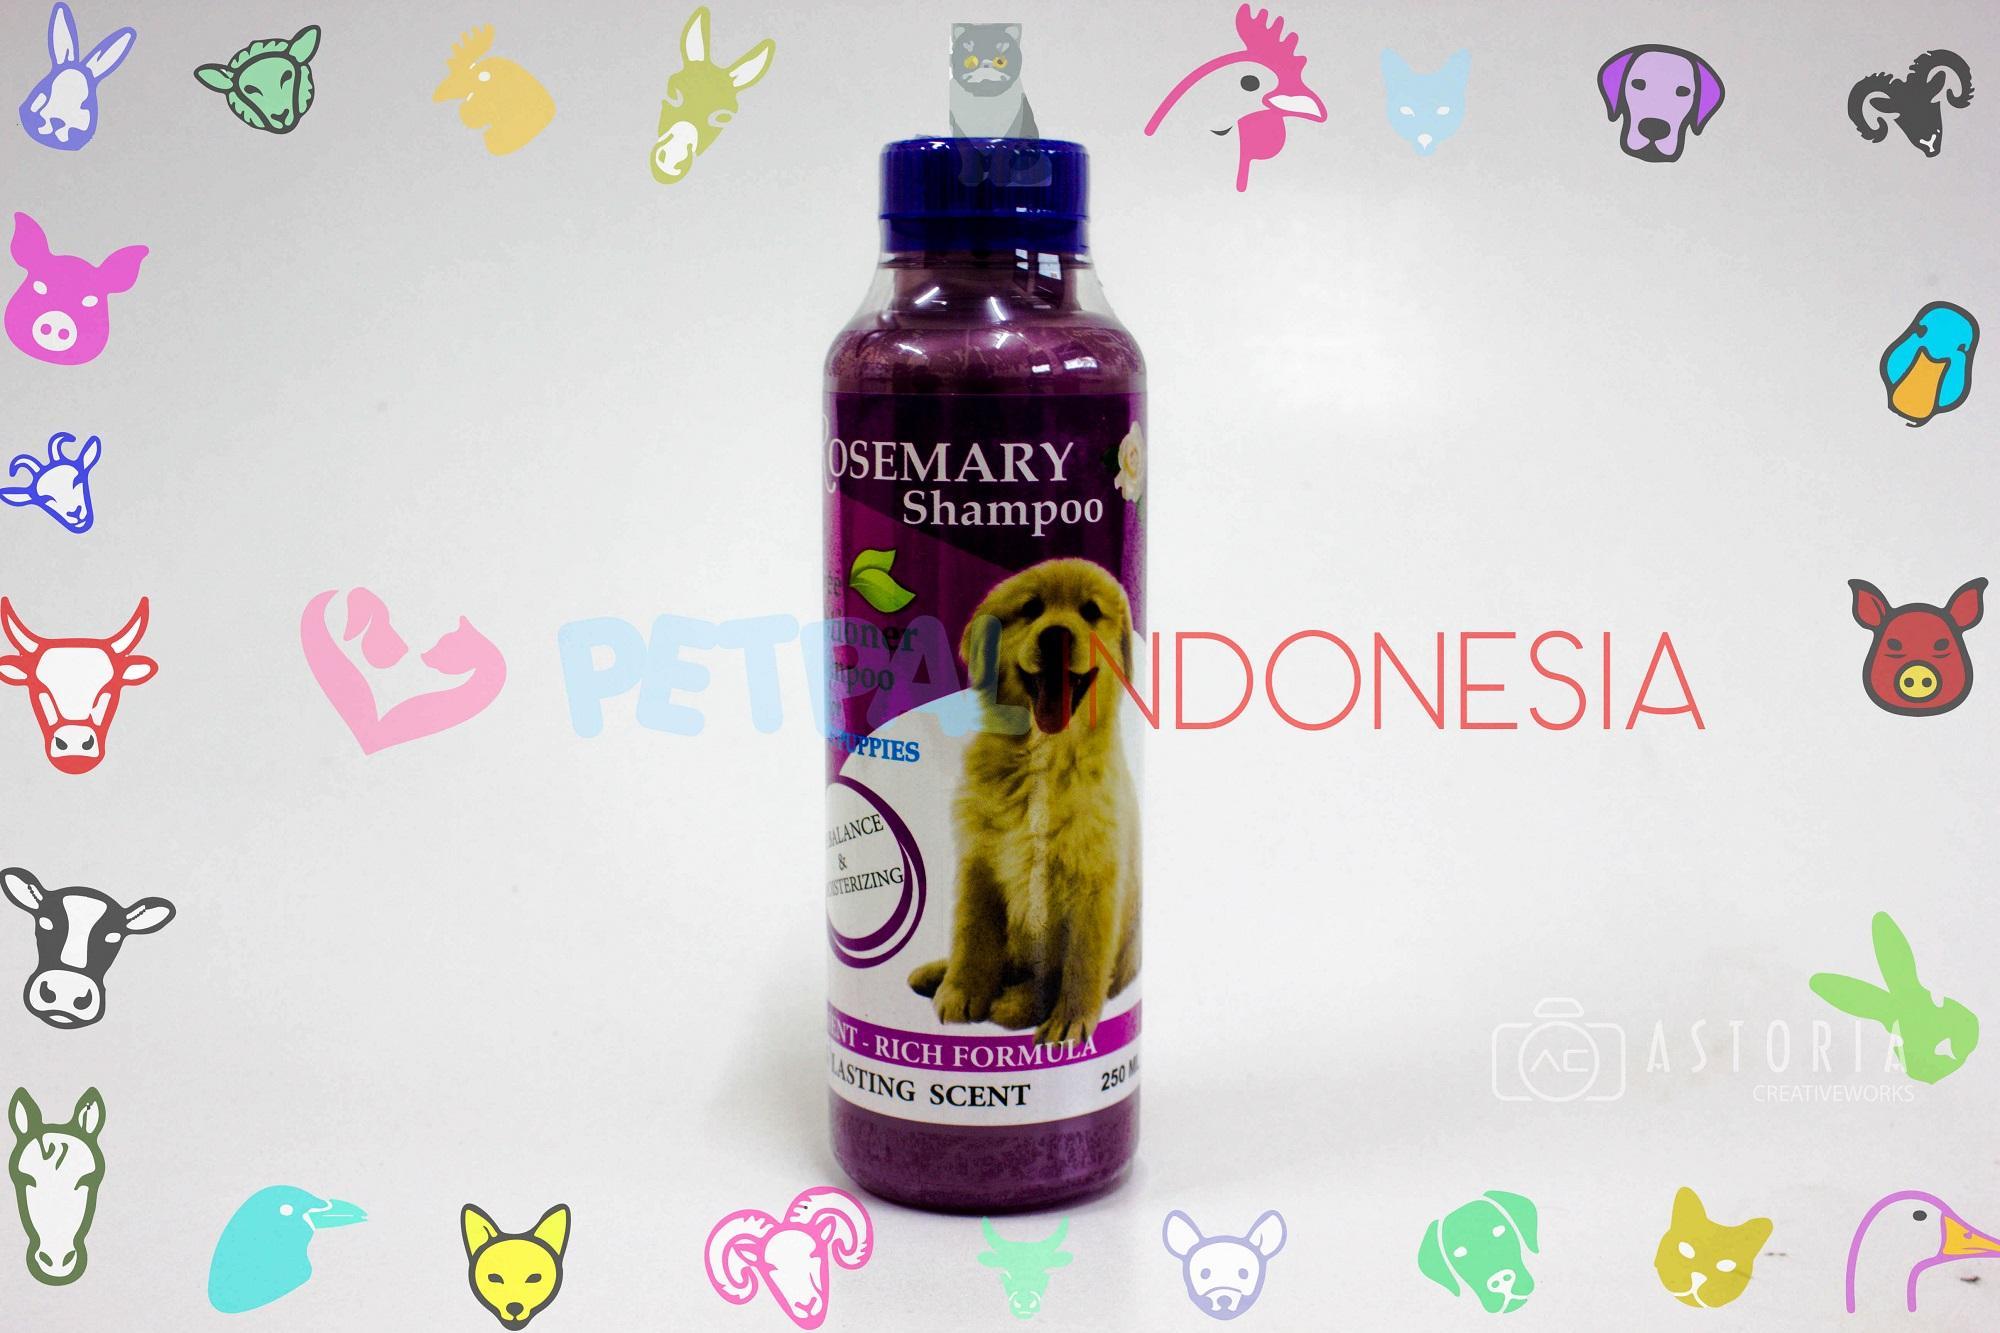 ROSEMARY SHAMPOO Tea Tree Conditioner Shampoo For Dog Puppies PH Balance Moisterizing Nutrient-Rich Formula